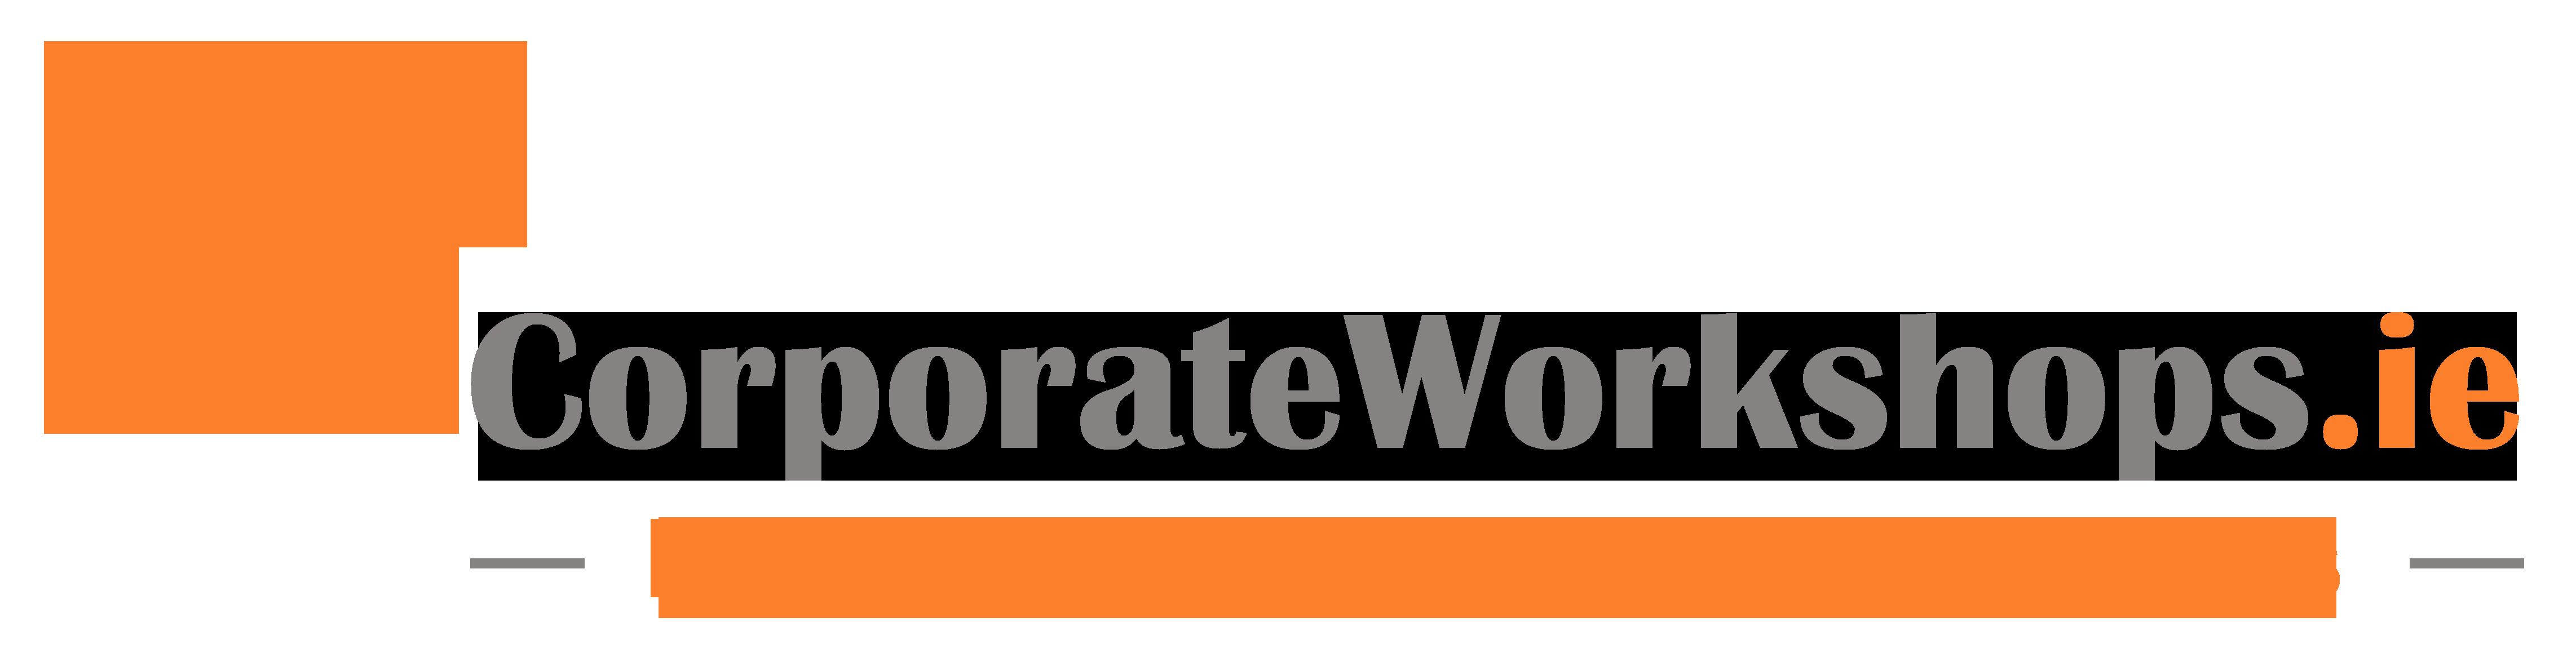 16-27-7-MS-Corporate-Workshops-Web-Version